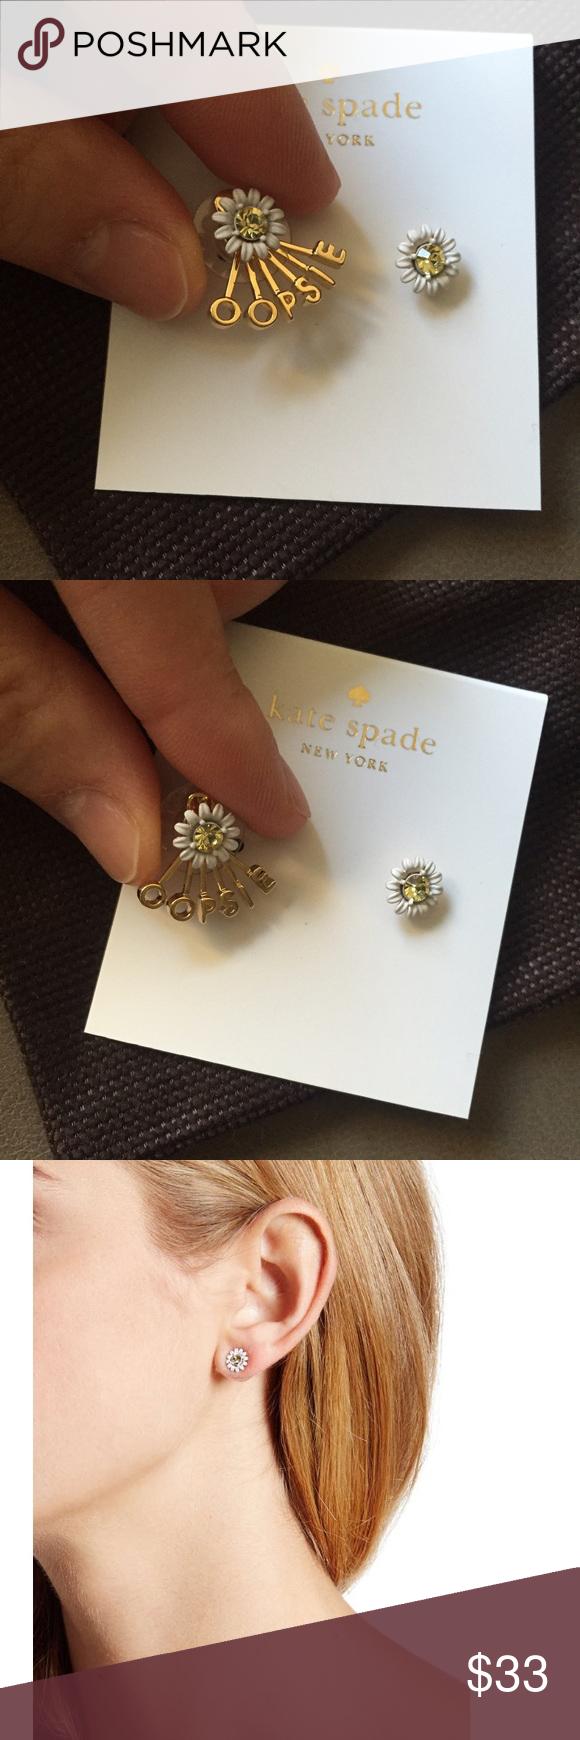 Kate Spade Stud Earrings Never Worn New Daisy And 1 Oopsie Dust